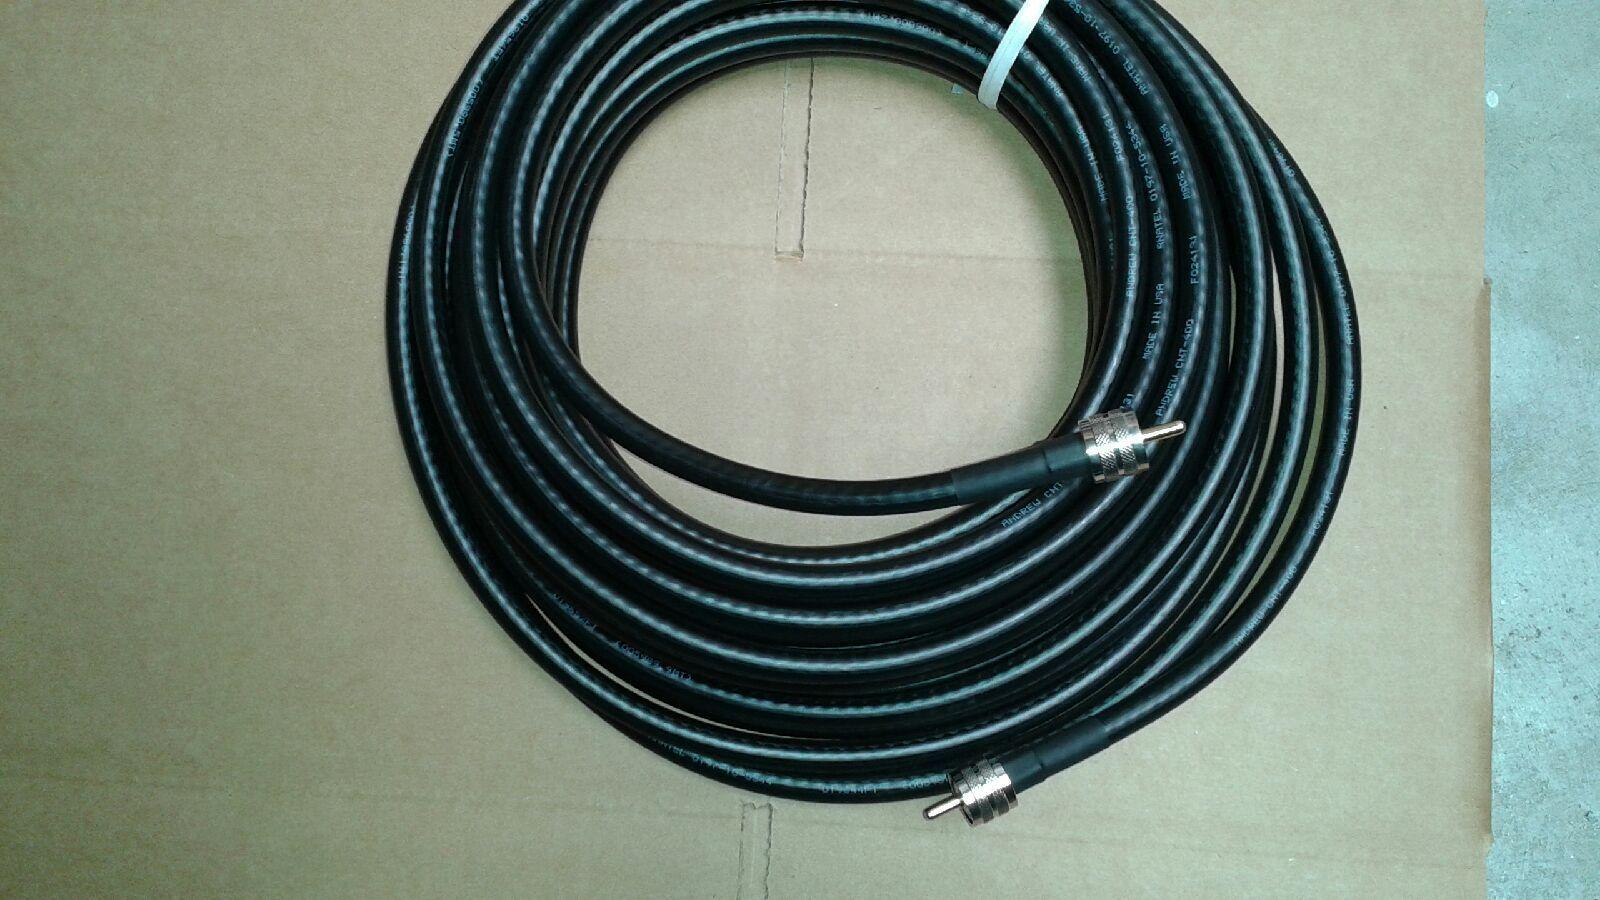 20 FT  LMR-400  Ham Radio LMR Antenna  PL-259 UHF to PL-259  Male  coax cable